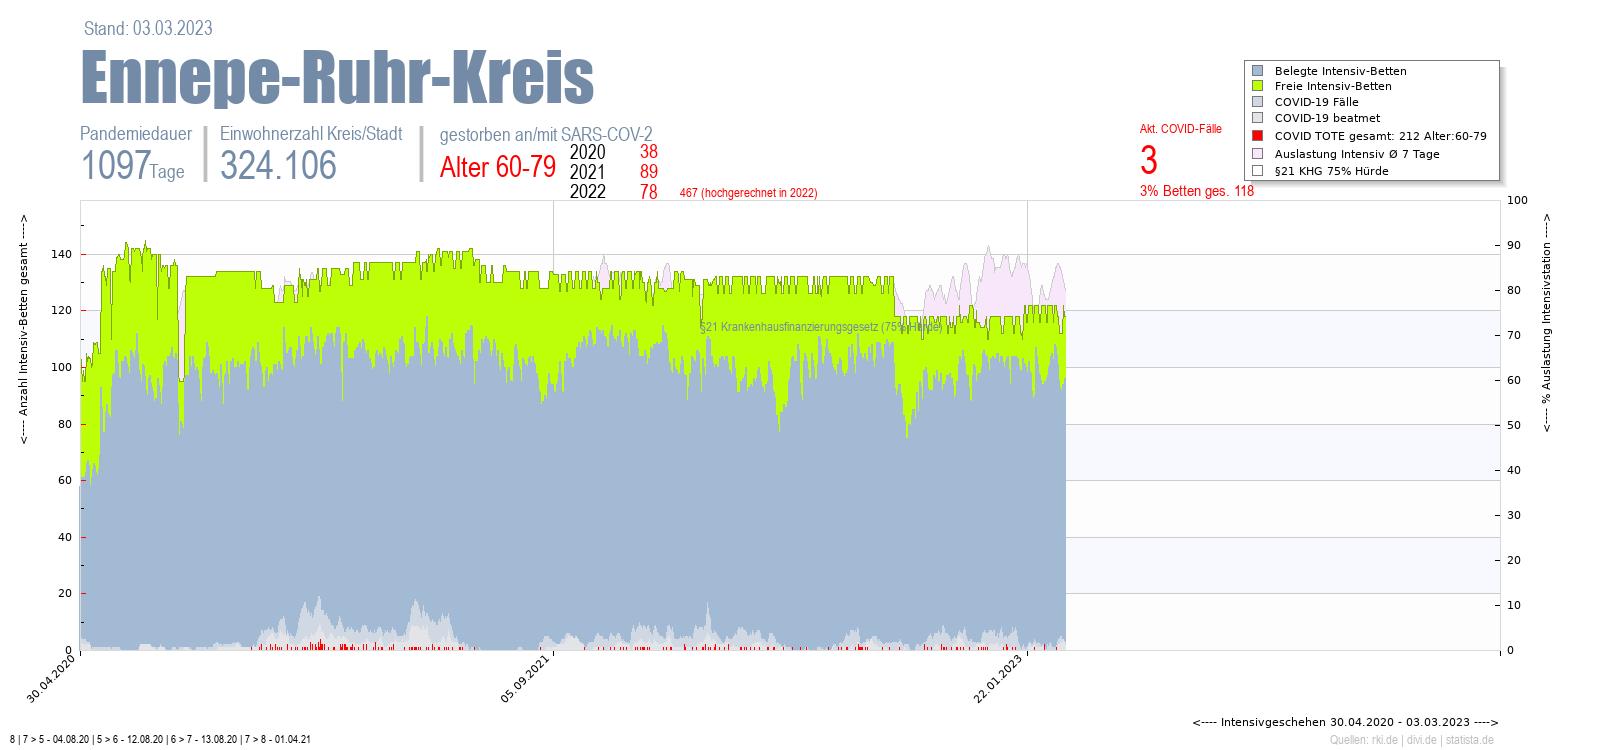 Intensivstation Auslastung Ennepe-Ruhr-Kreis Alter 0-4